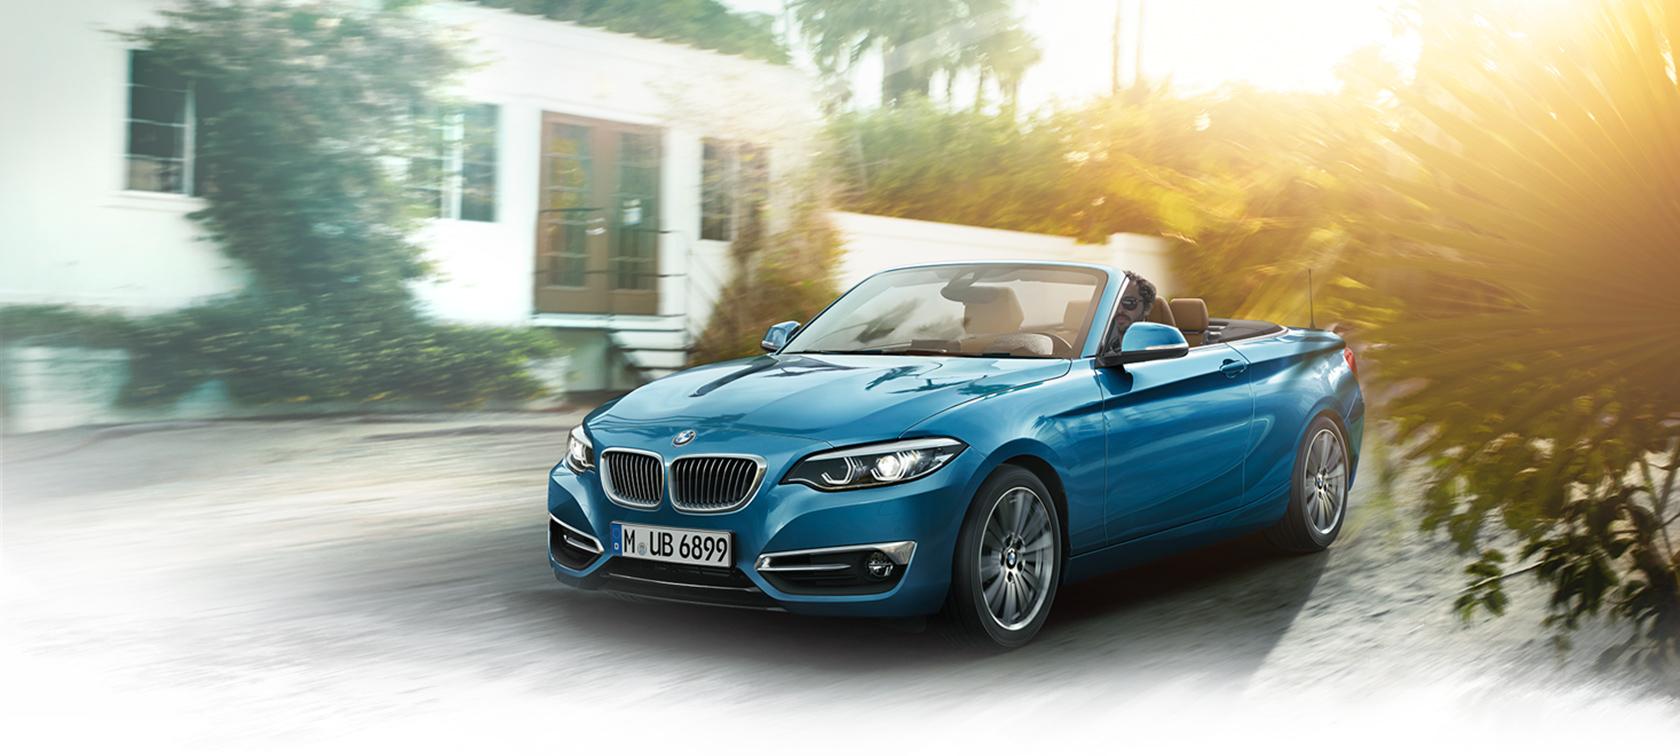 BMW 2 Series Convertible: Design